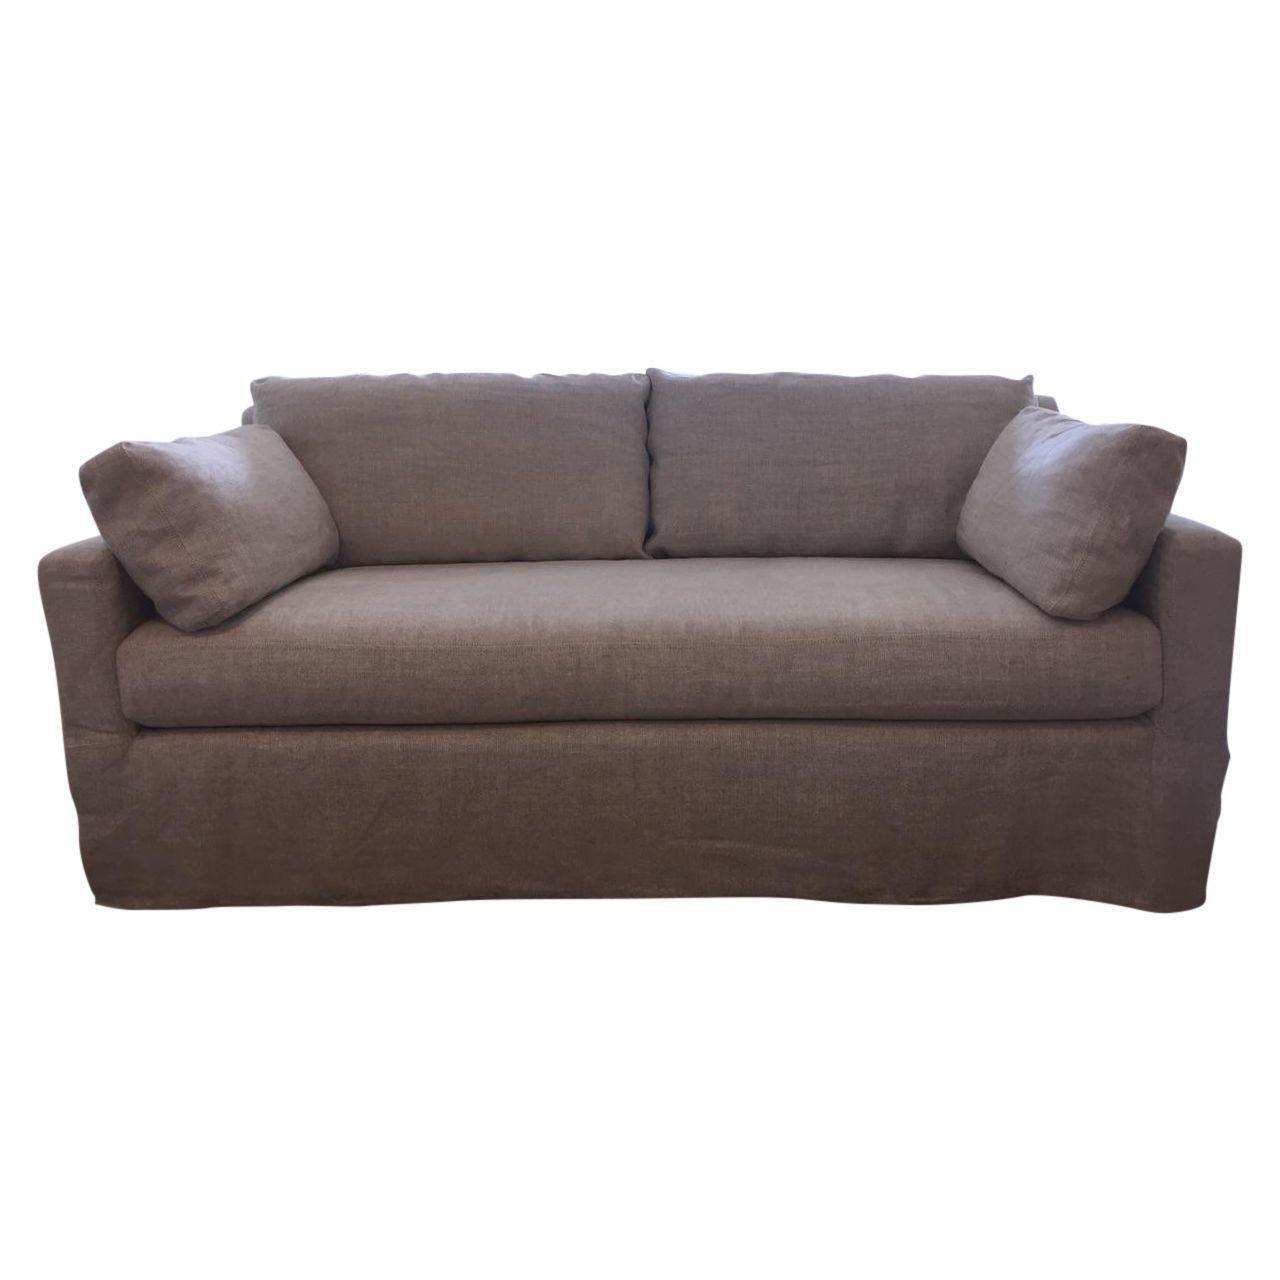 restoration hardware sectional sofa linen 3 2 seater sets belgian track arm chairish